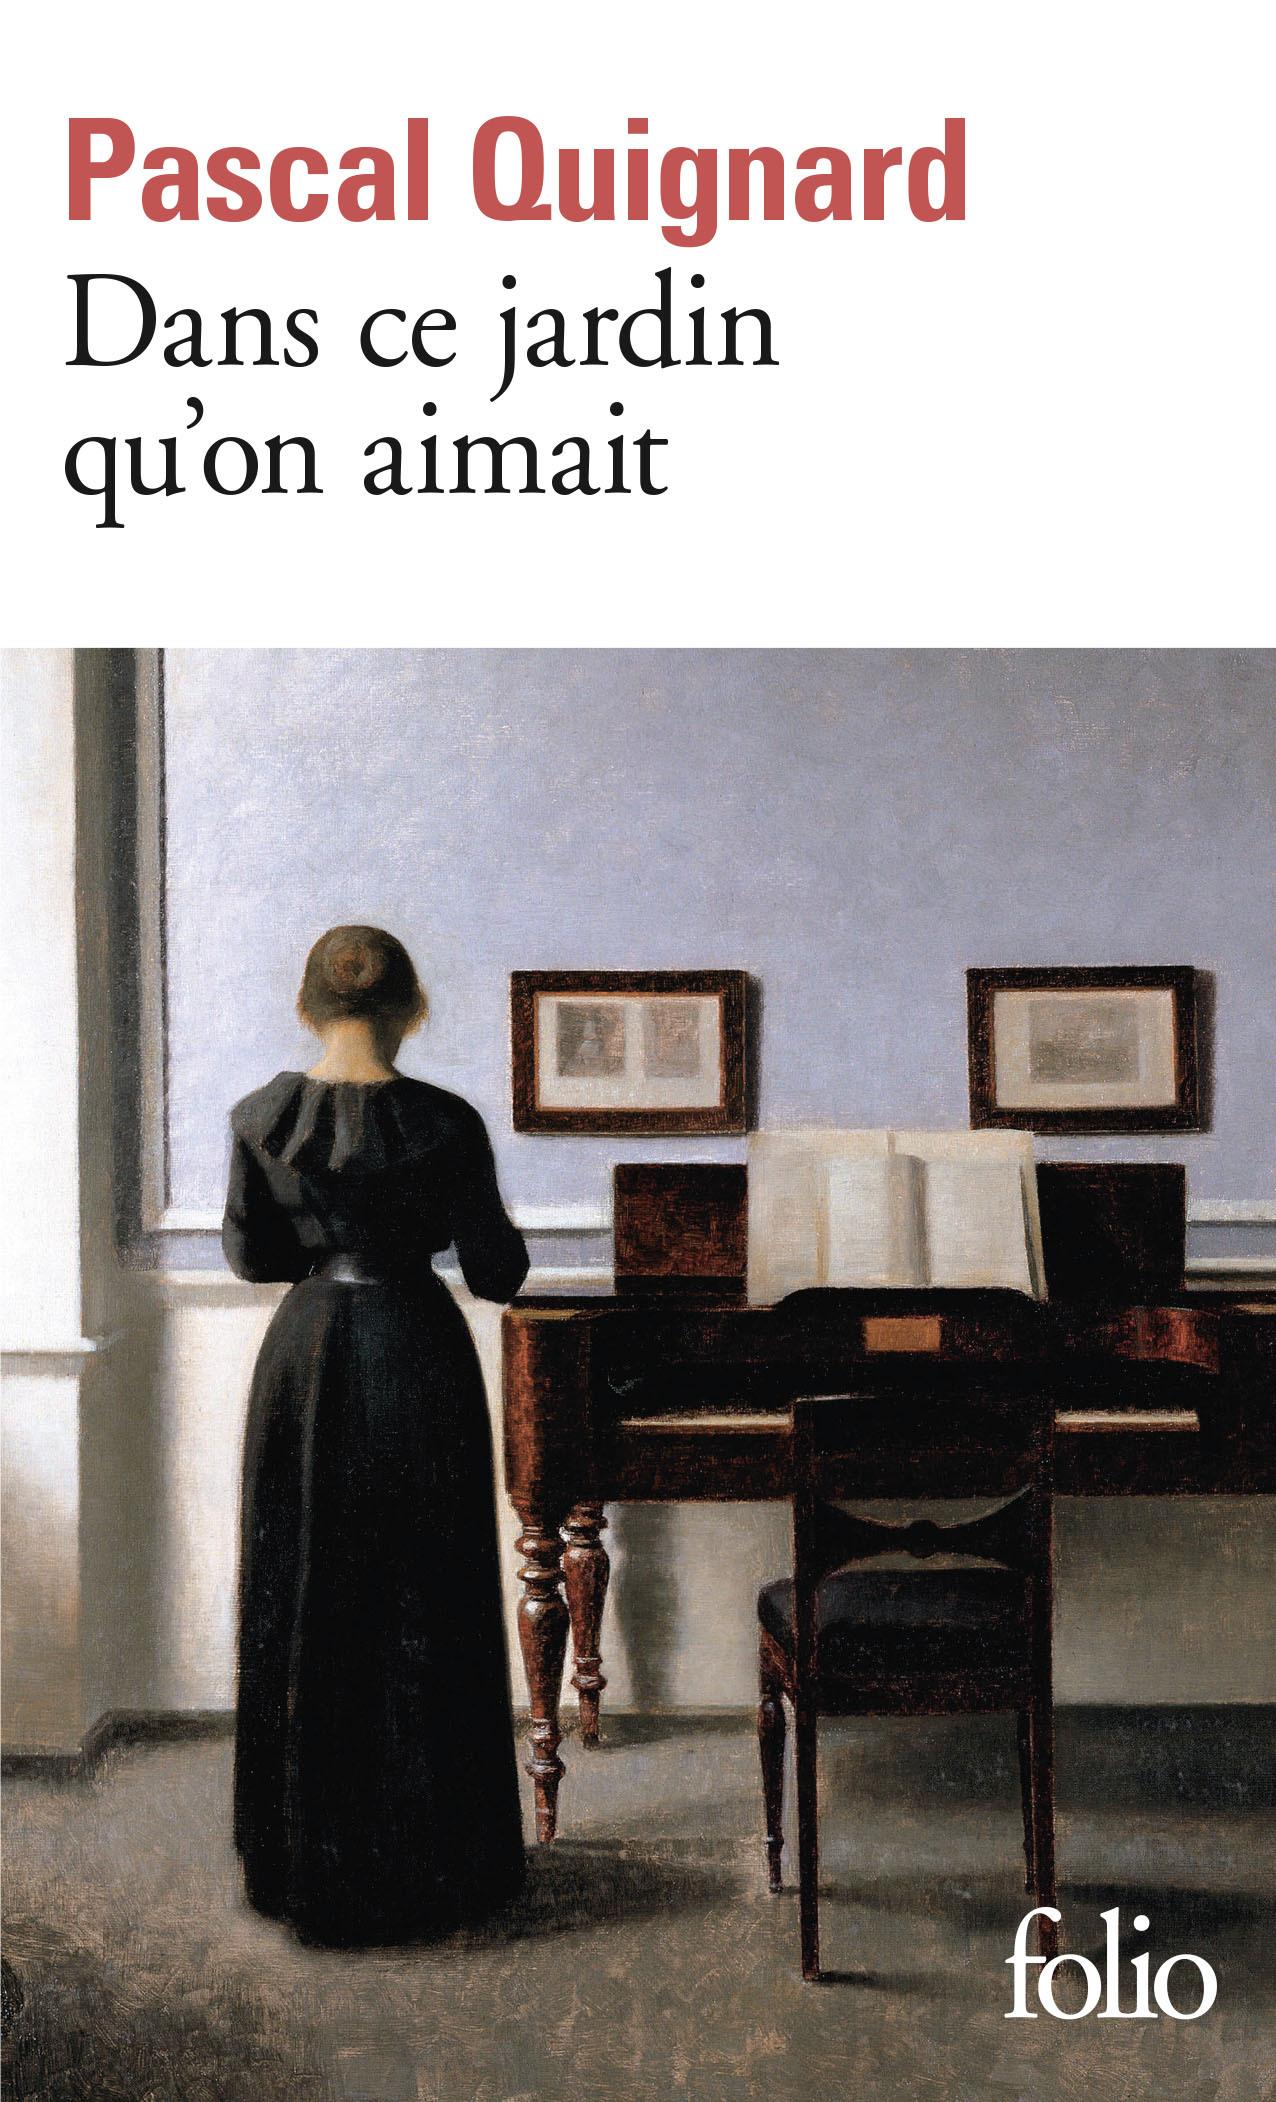 DANS CE JARDIN QU'ON AIMAIT